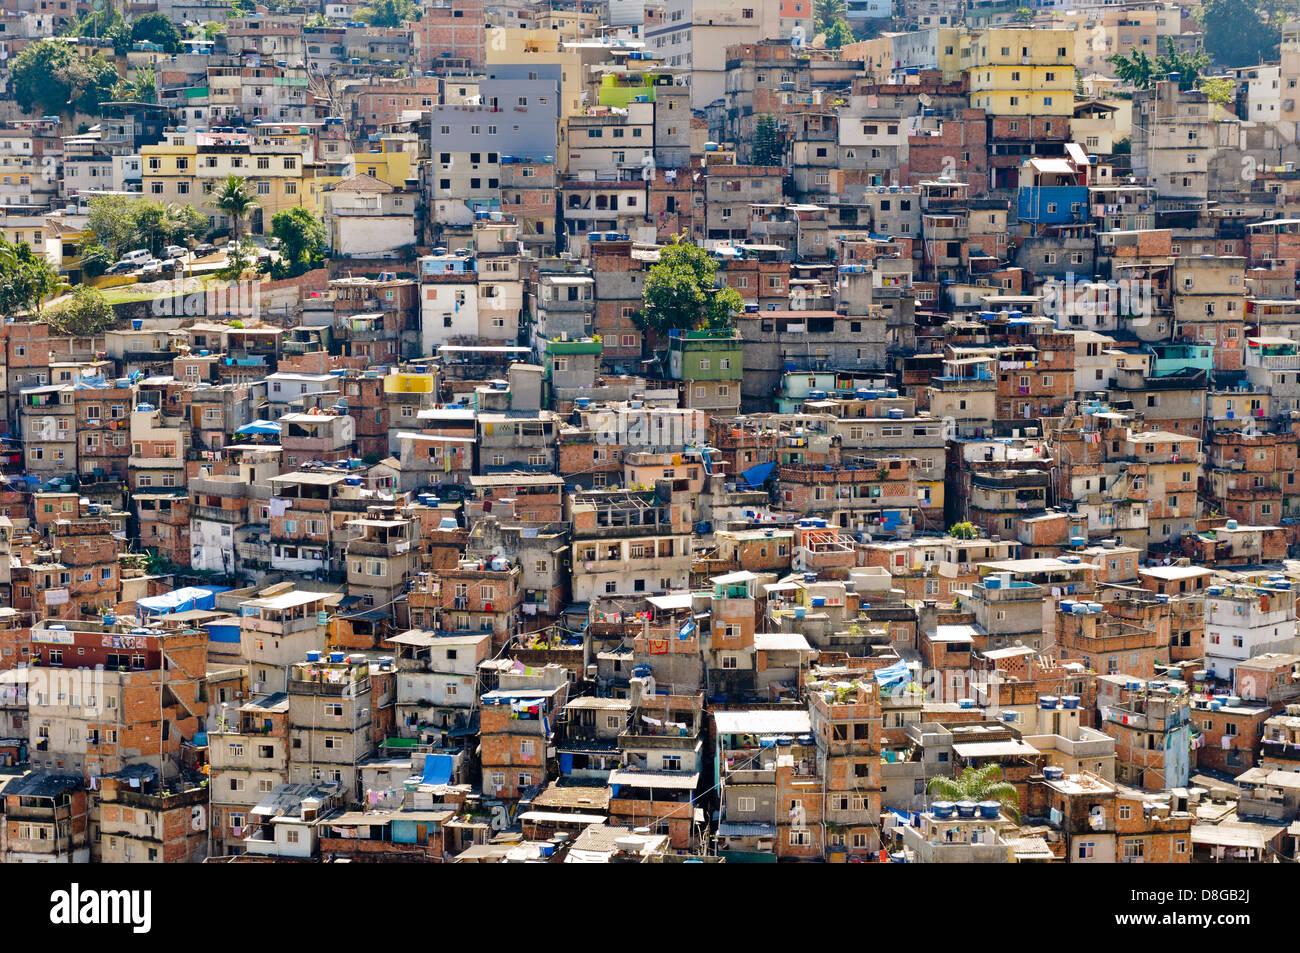 Old Slum of Rocinha, Housing, Rio de Janeiro, Brazil - Stock Image